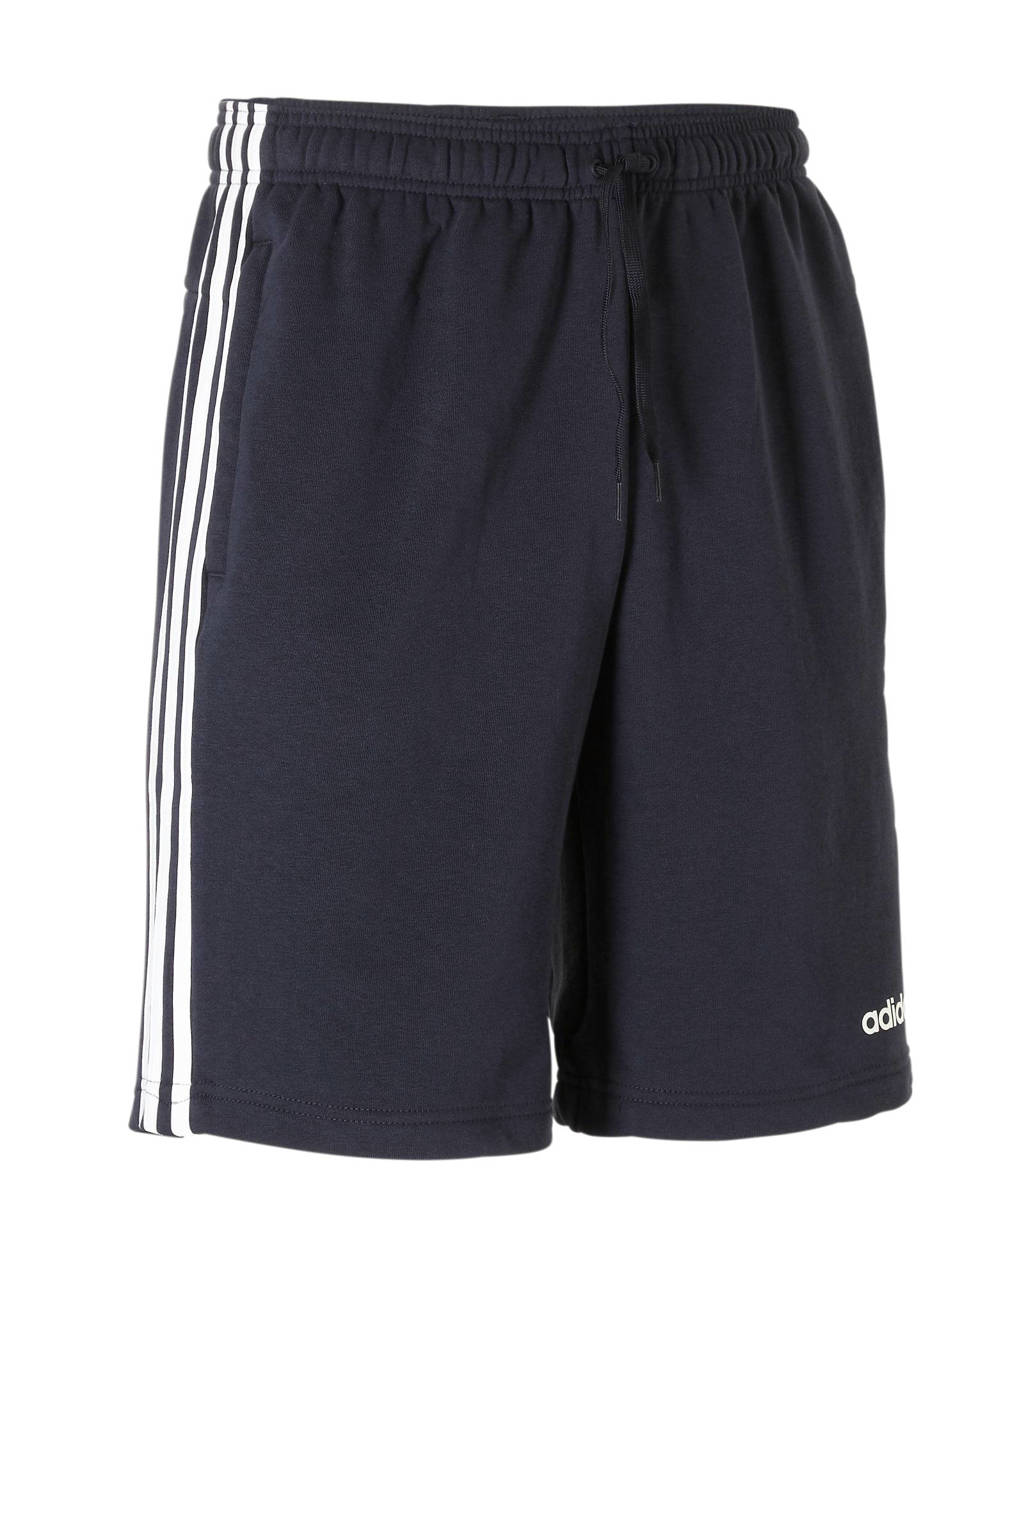 adidas performance   sportshort donkerblauw, Donkerblauw/wit